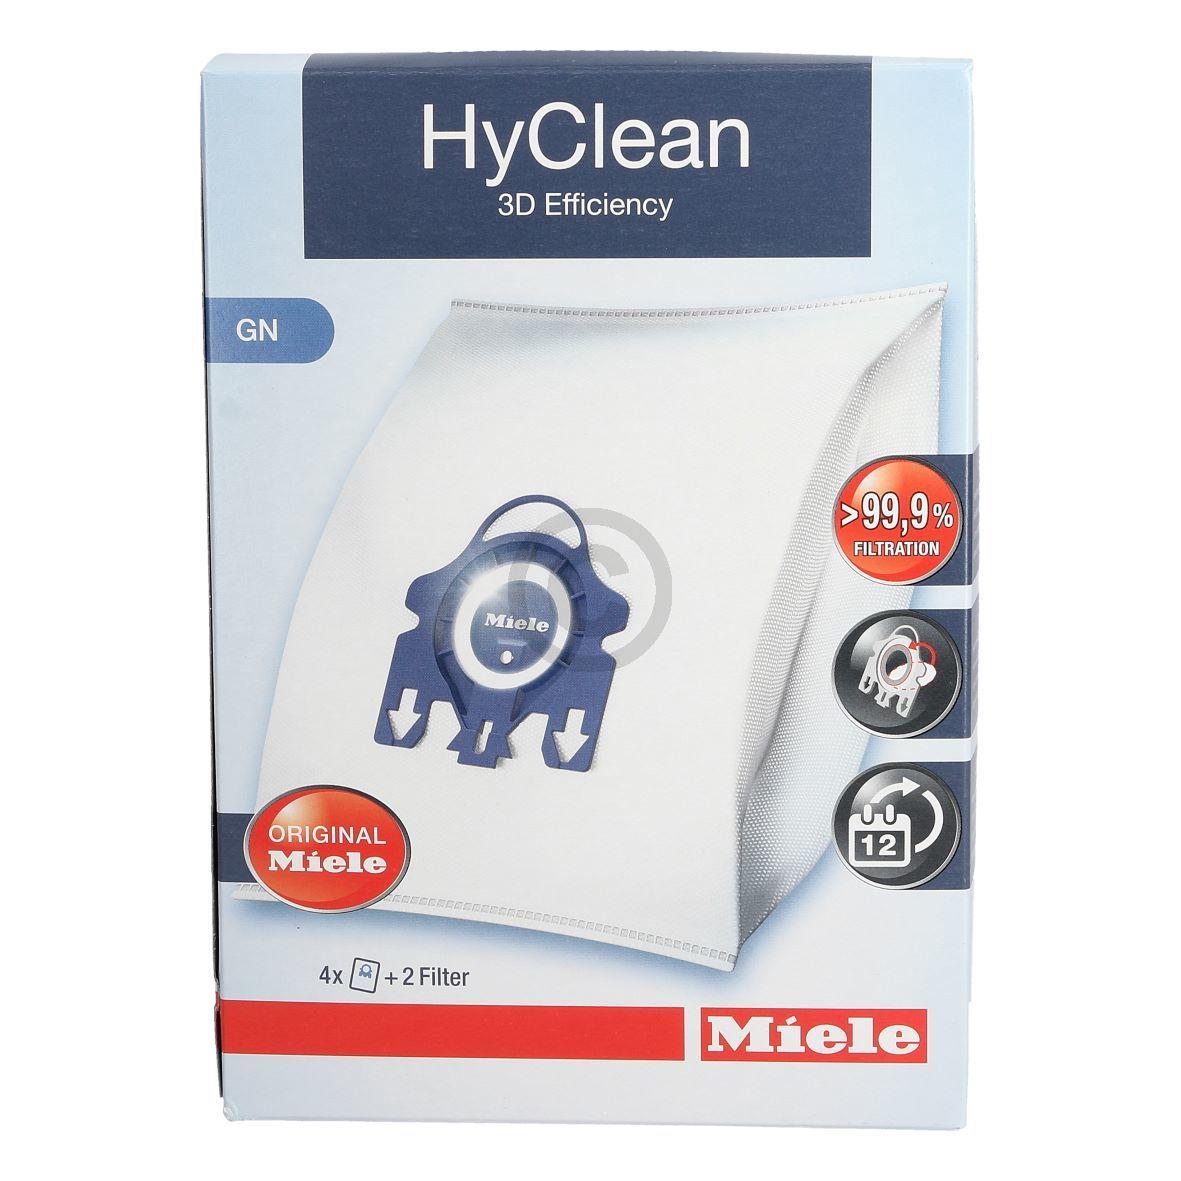 Miele Filterbeutel Miele TypG/N HyClean 3D Efficiency, OT! 9917730